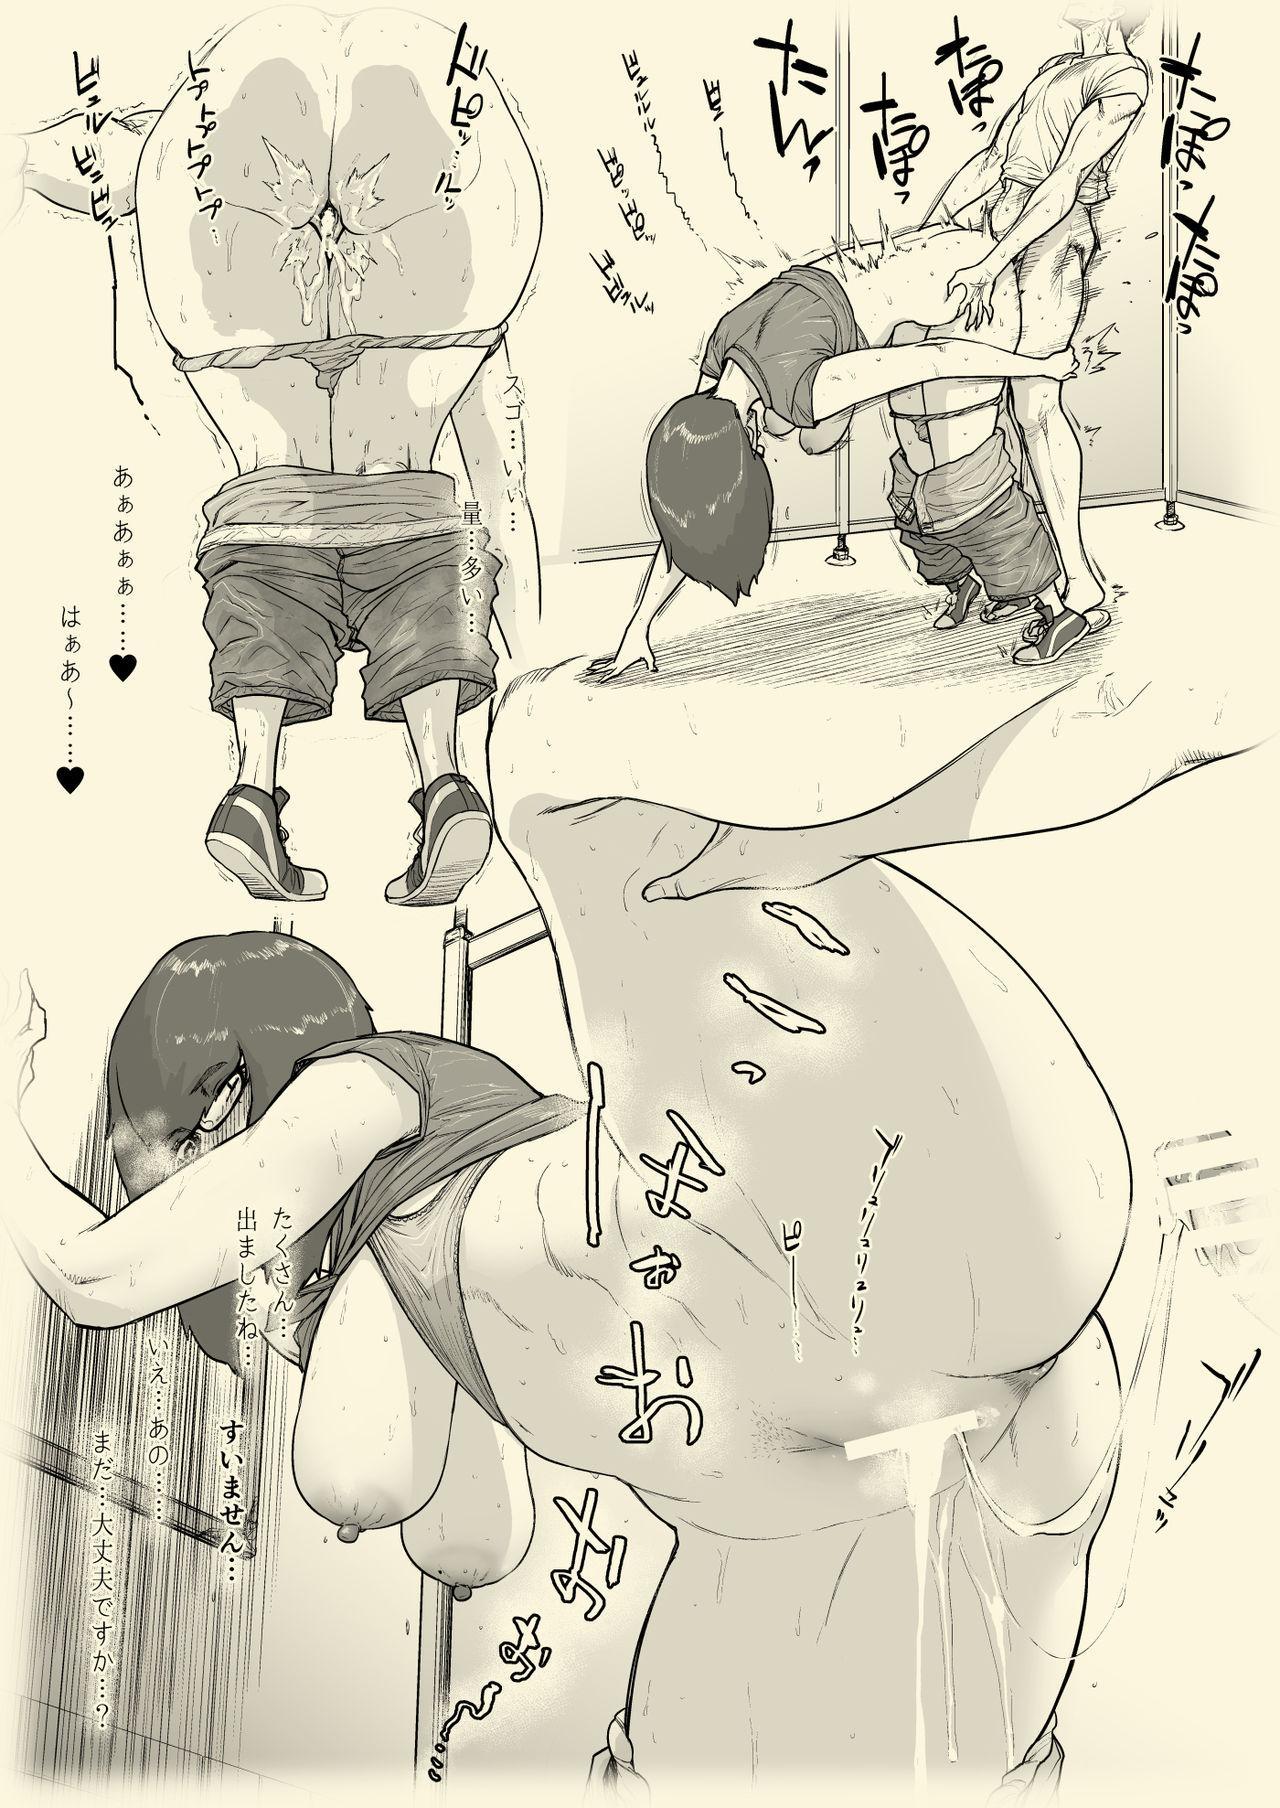 1000 Yen Cut no Onee-san ni Suite Morau Hon. II 9